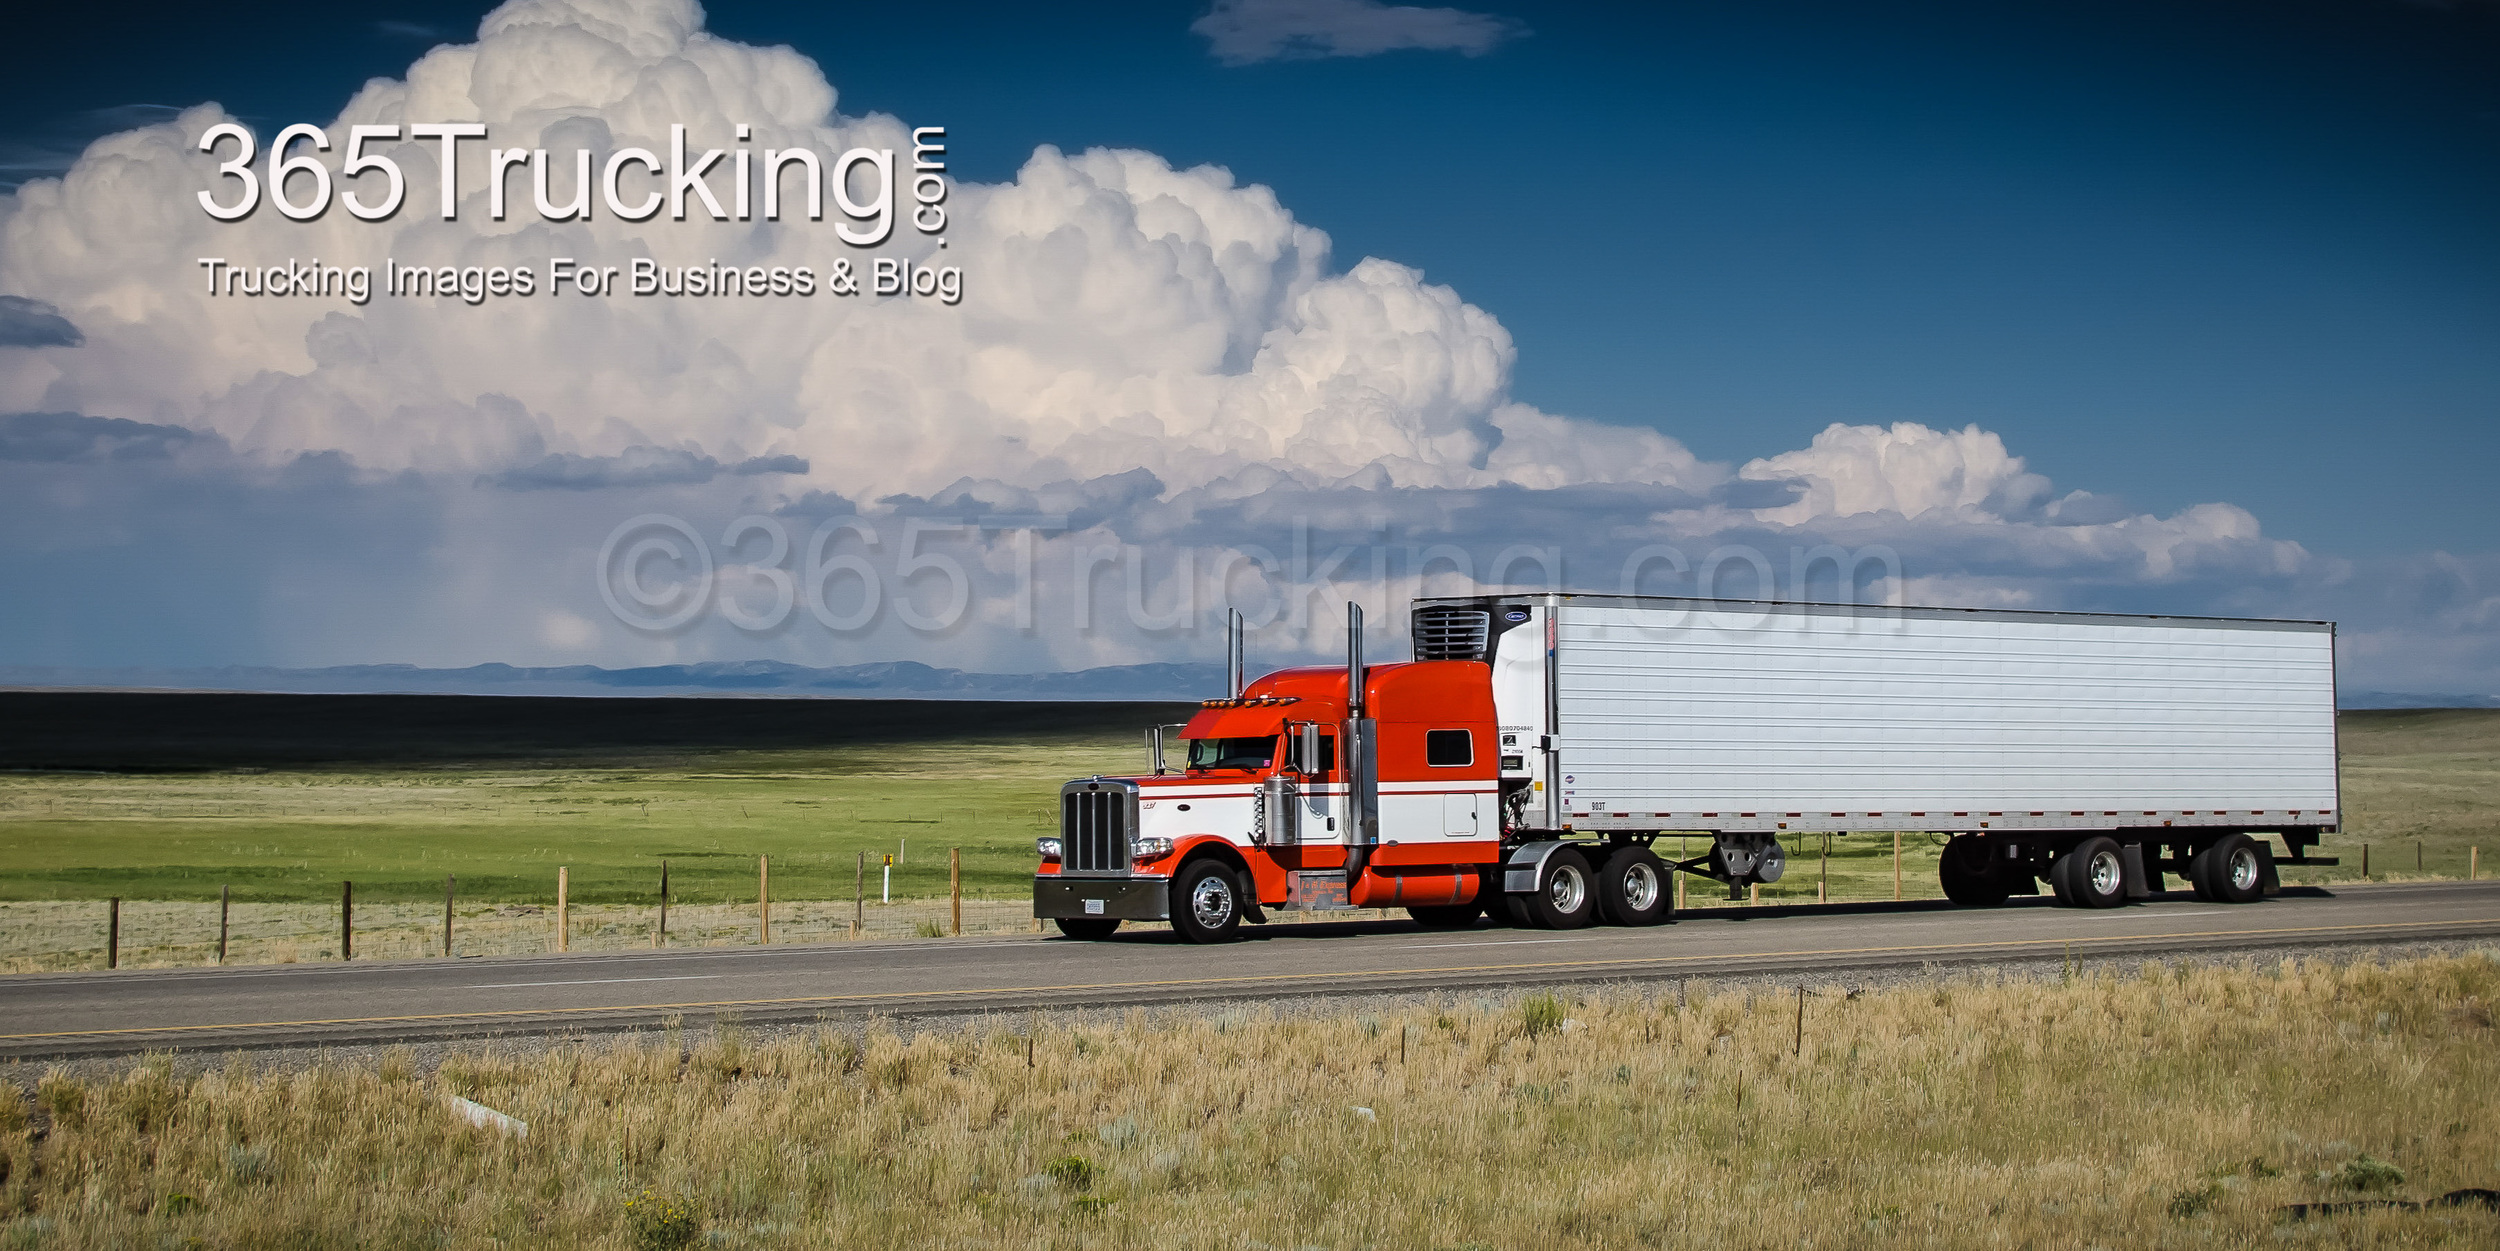 Truck_072913_LR-173.jpg